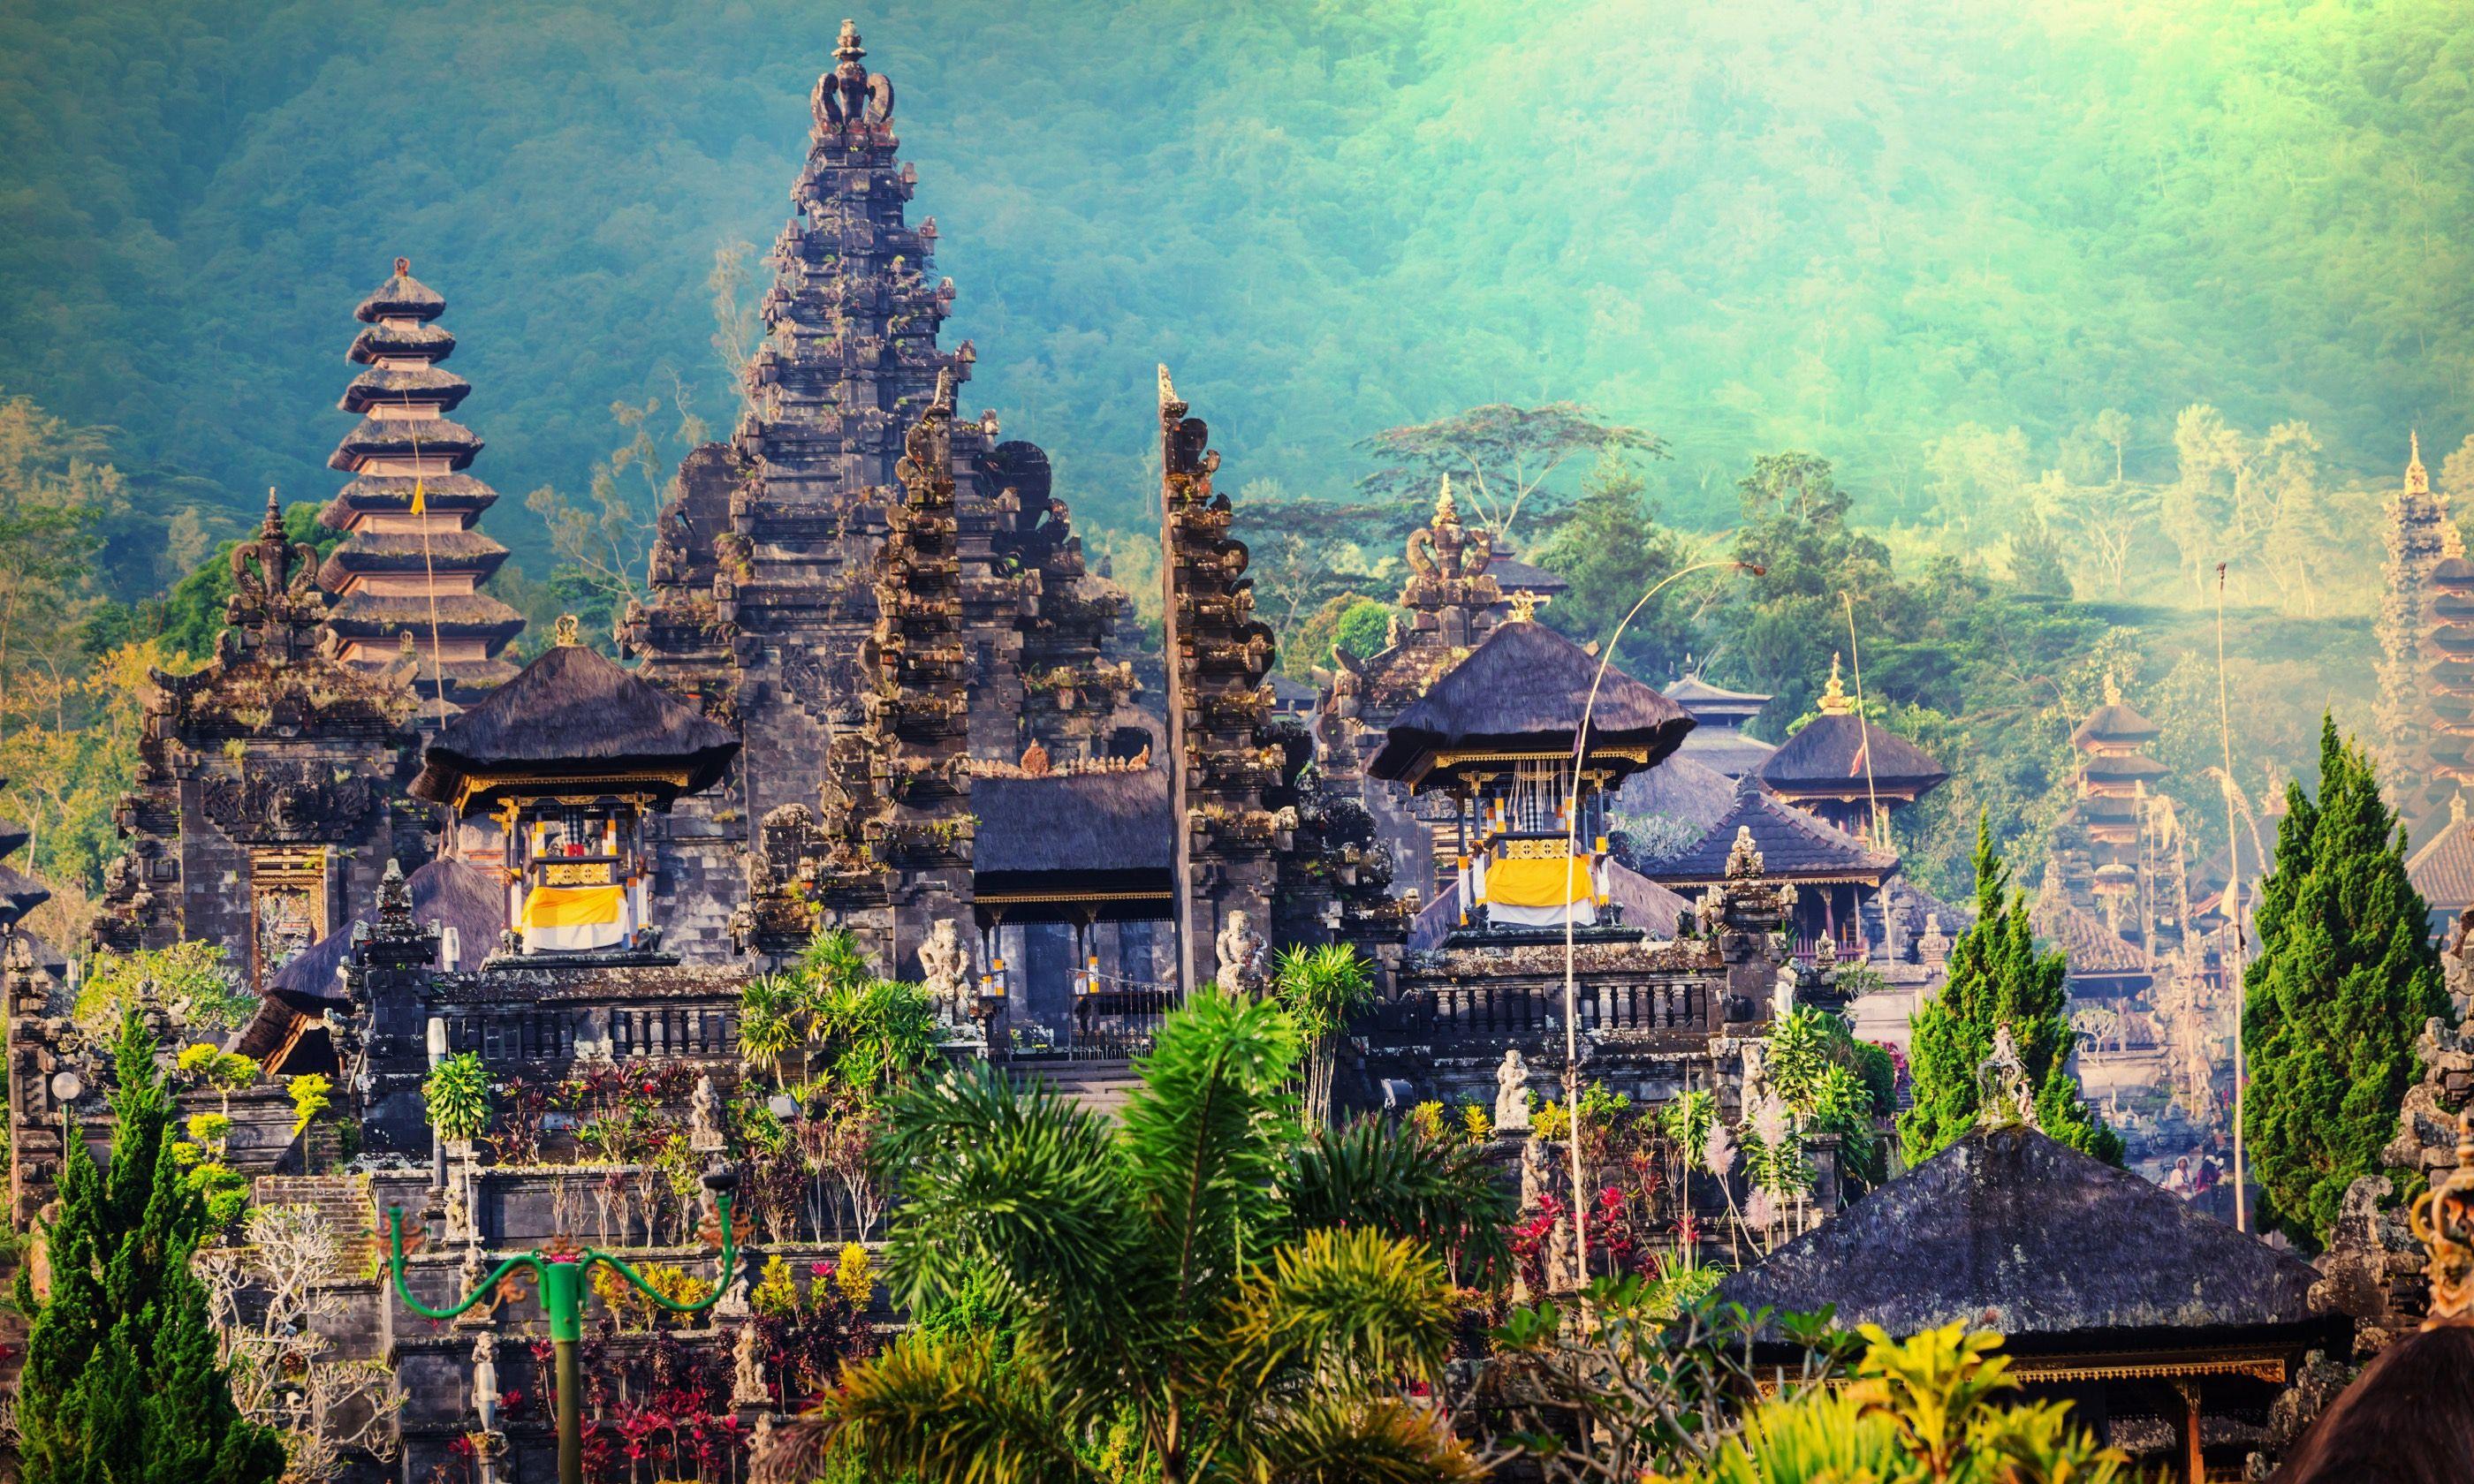 Pura Besakih Temple, Bali (Shutterstock.com)